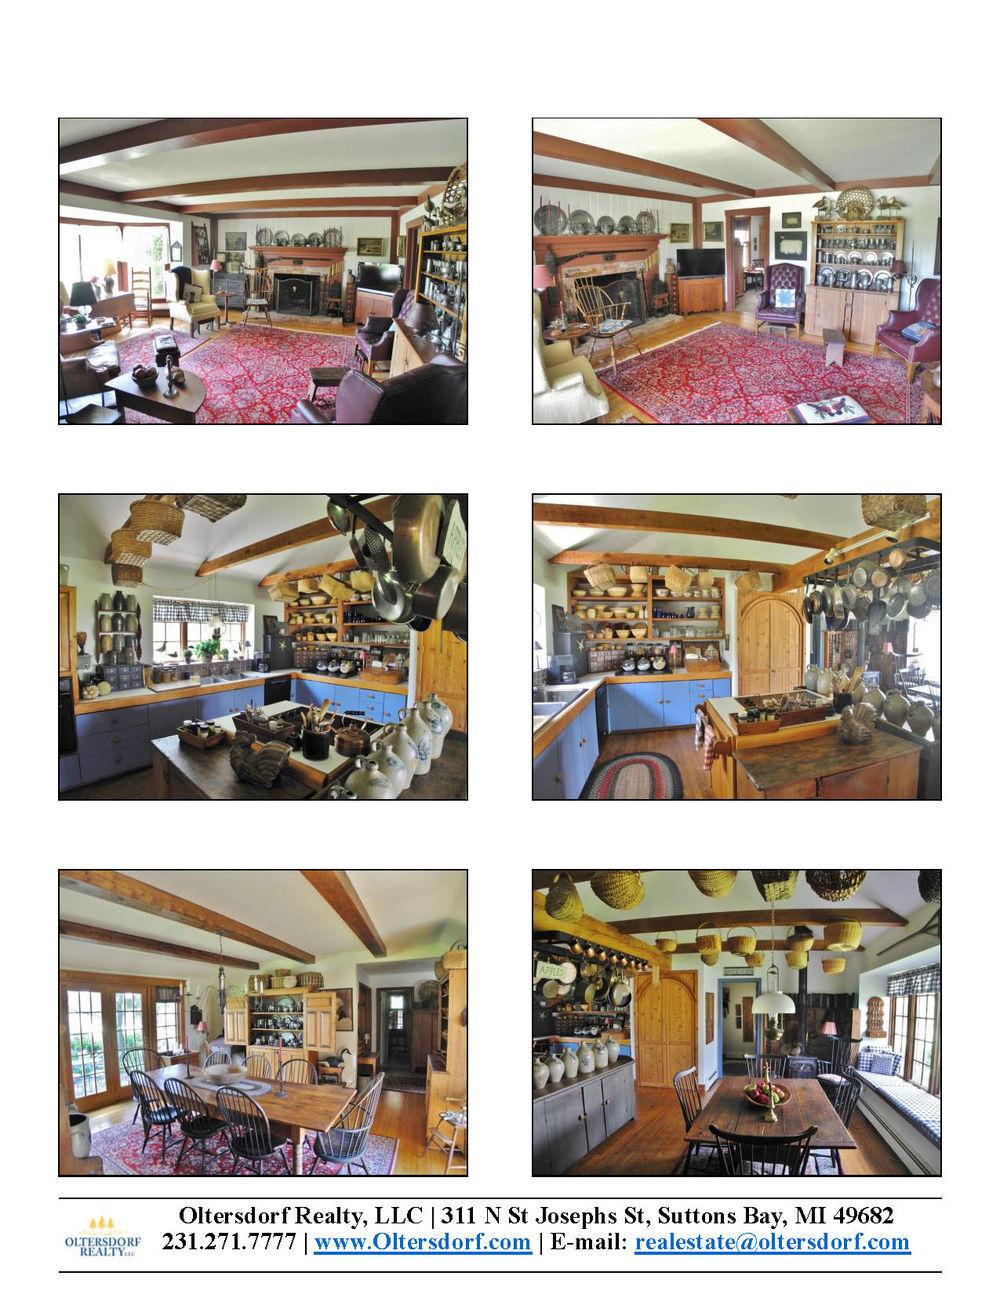 7251 E Alpers Road, Lake Leelanau, MI – Historic 1865 Centennial Inn For Sale By Oltersdorf Realty LLC Information Packet (5).jpg